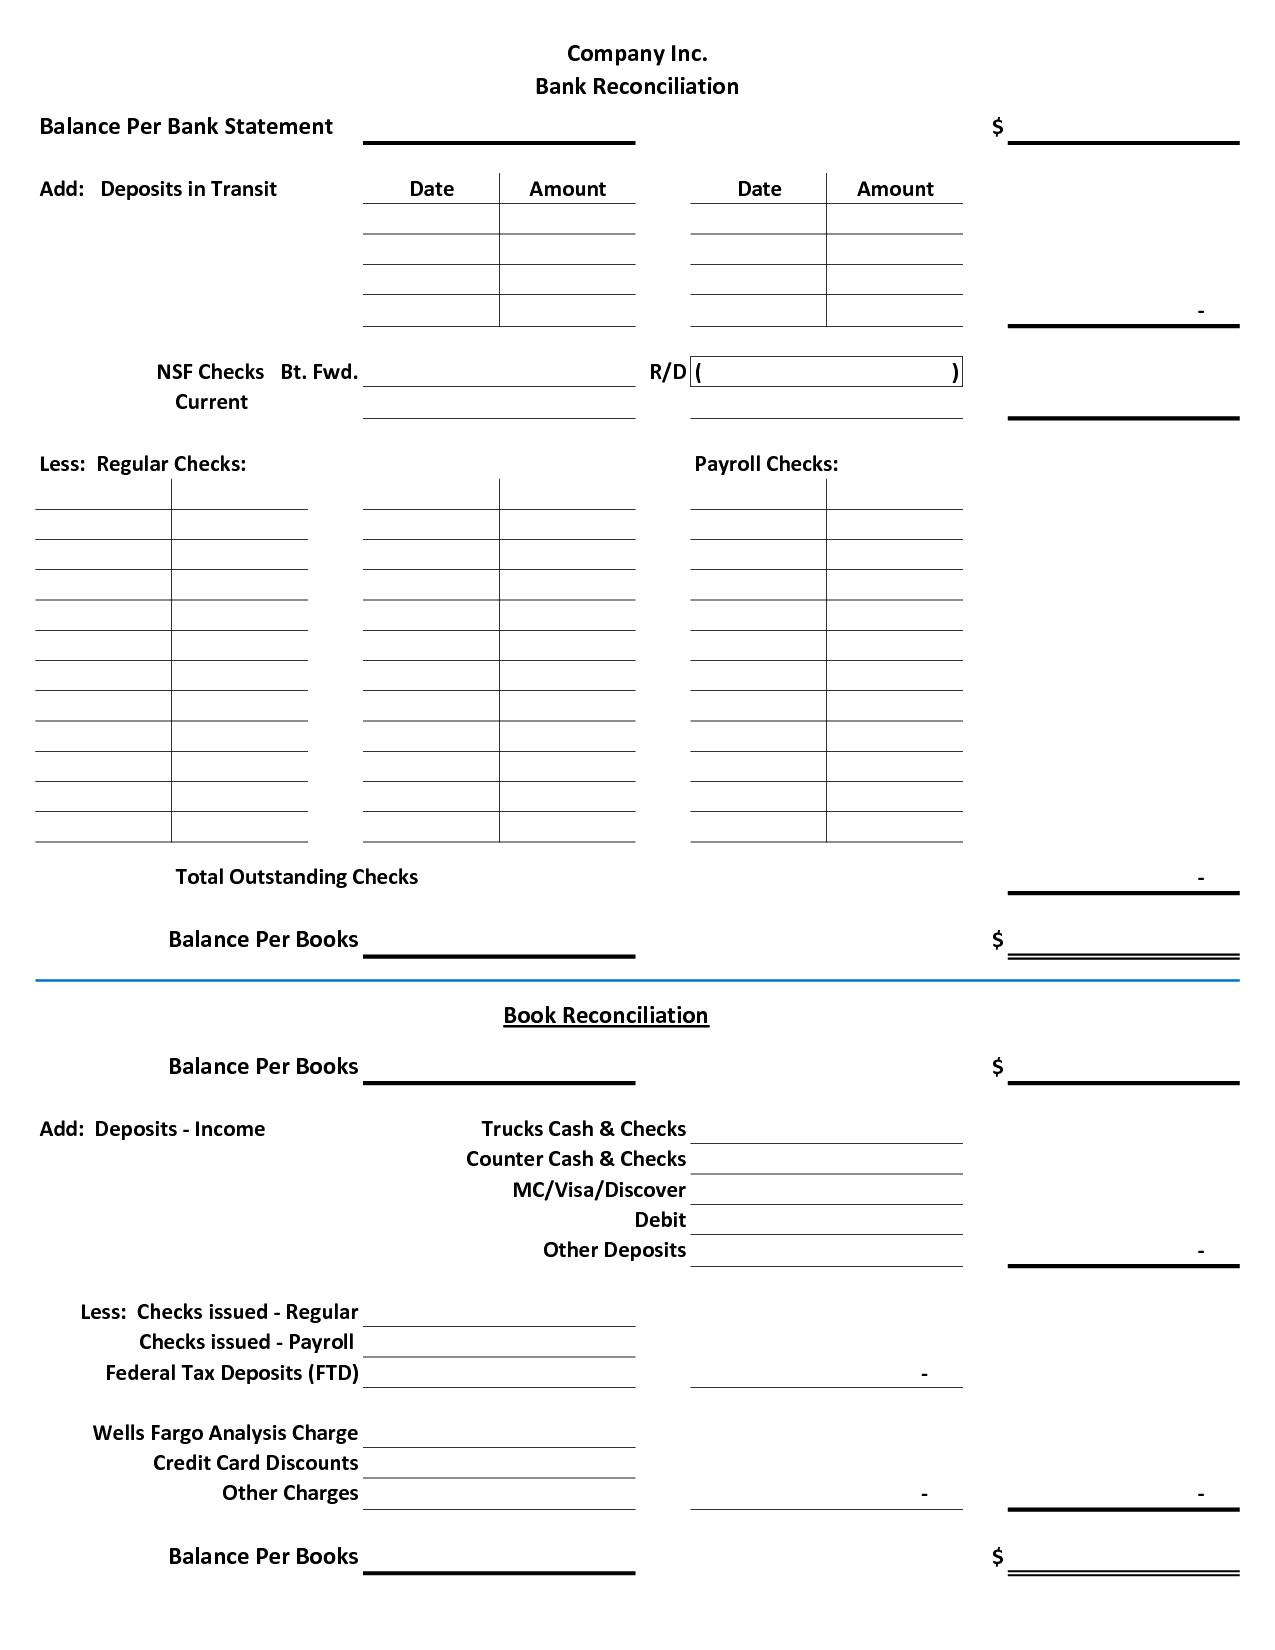 Trust Account Reconciliation Template Blank Bank Reconciliation form Portablegasgrillweber Com